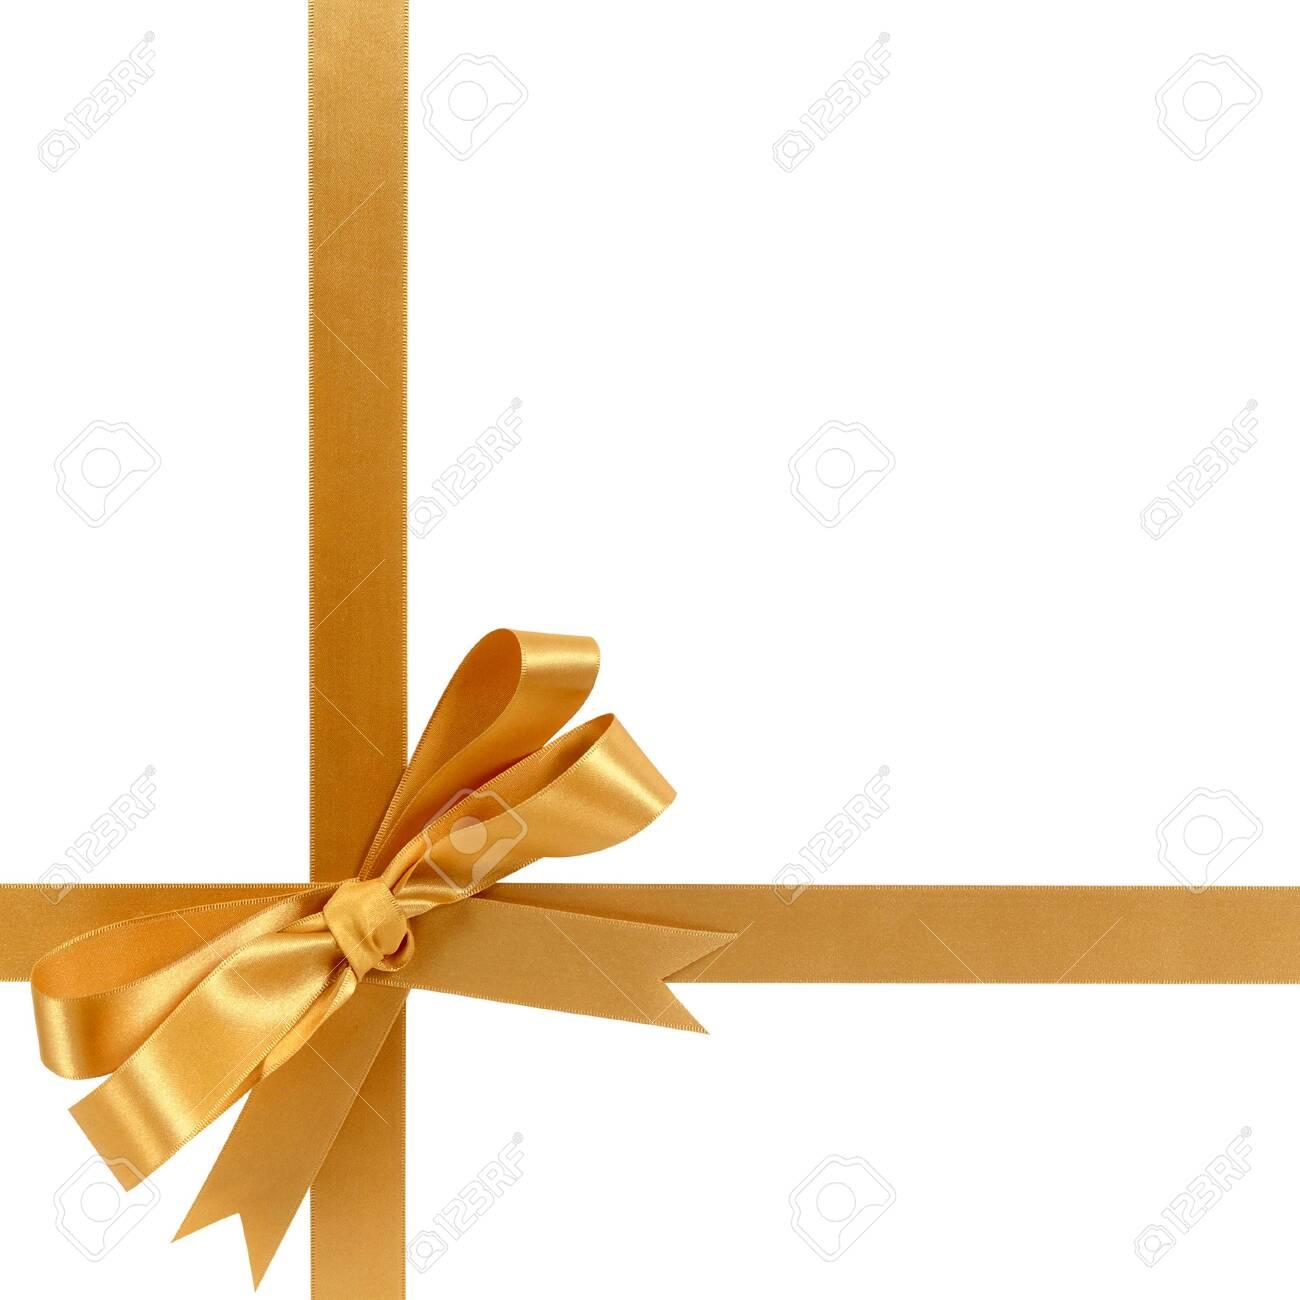 Gold gift ribbon bow horizontal bottom corner cross shape isolated on white. - 131002612